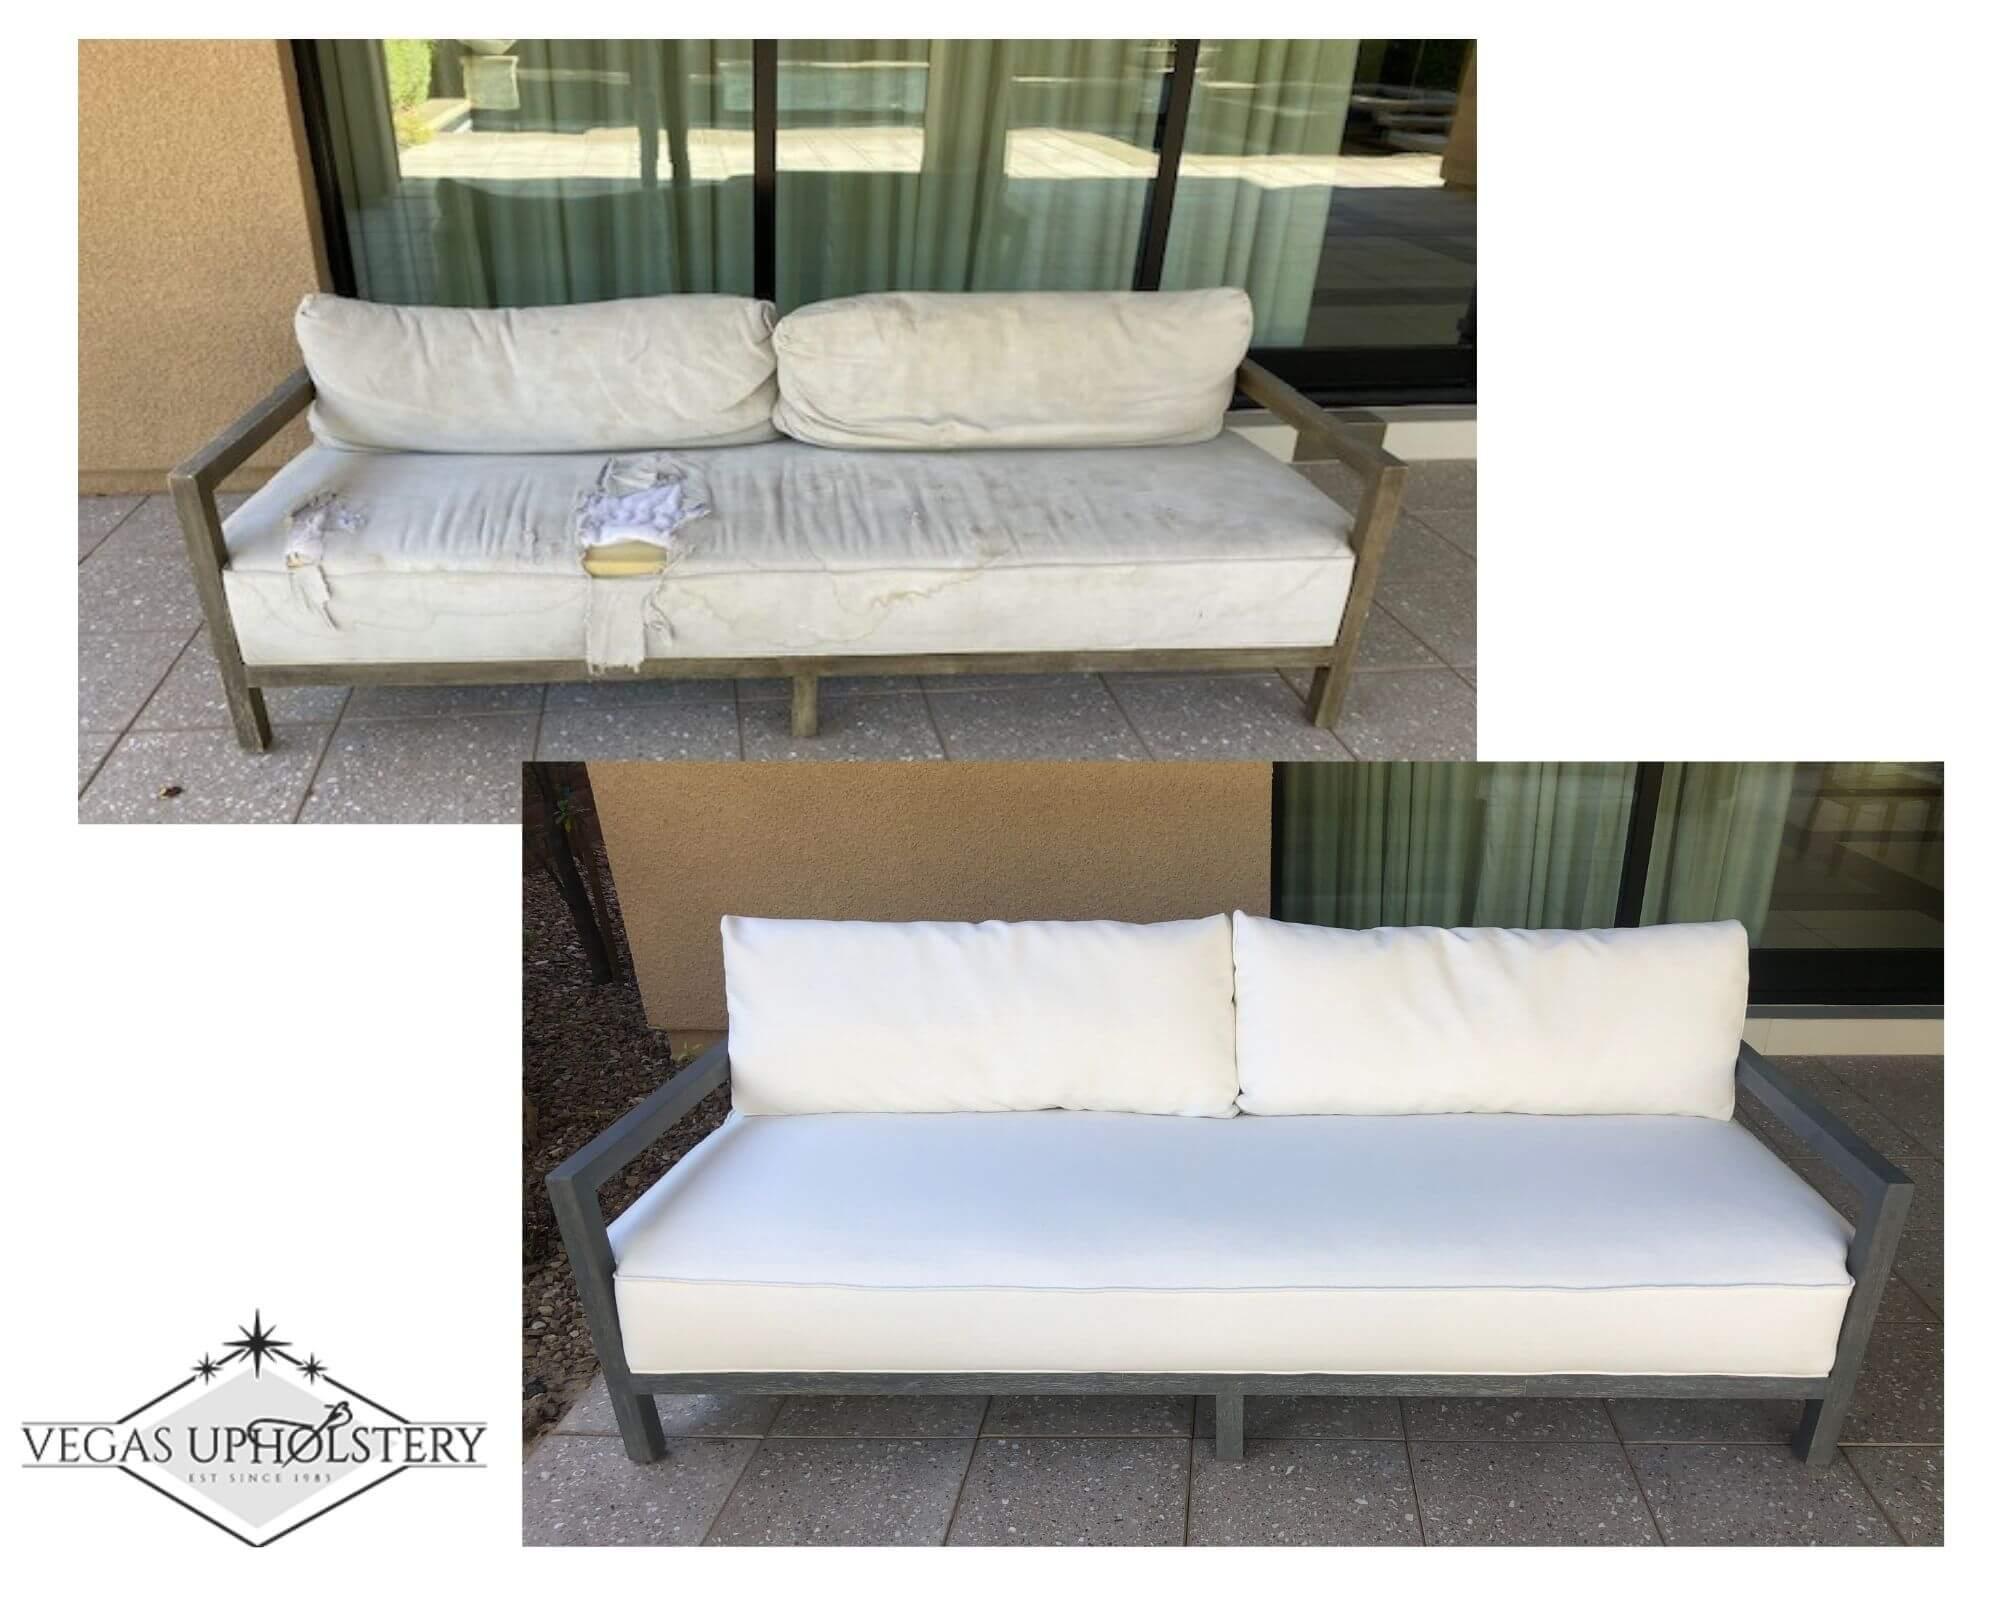 Vegas upholstery Patio Set